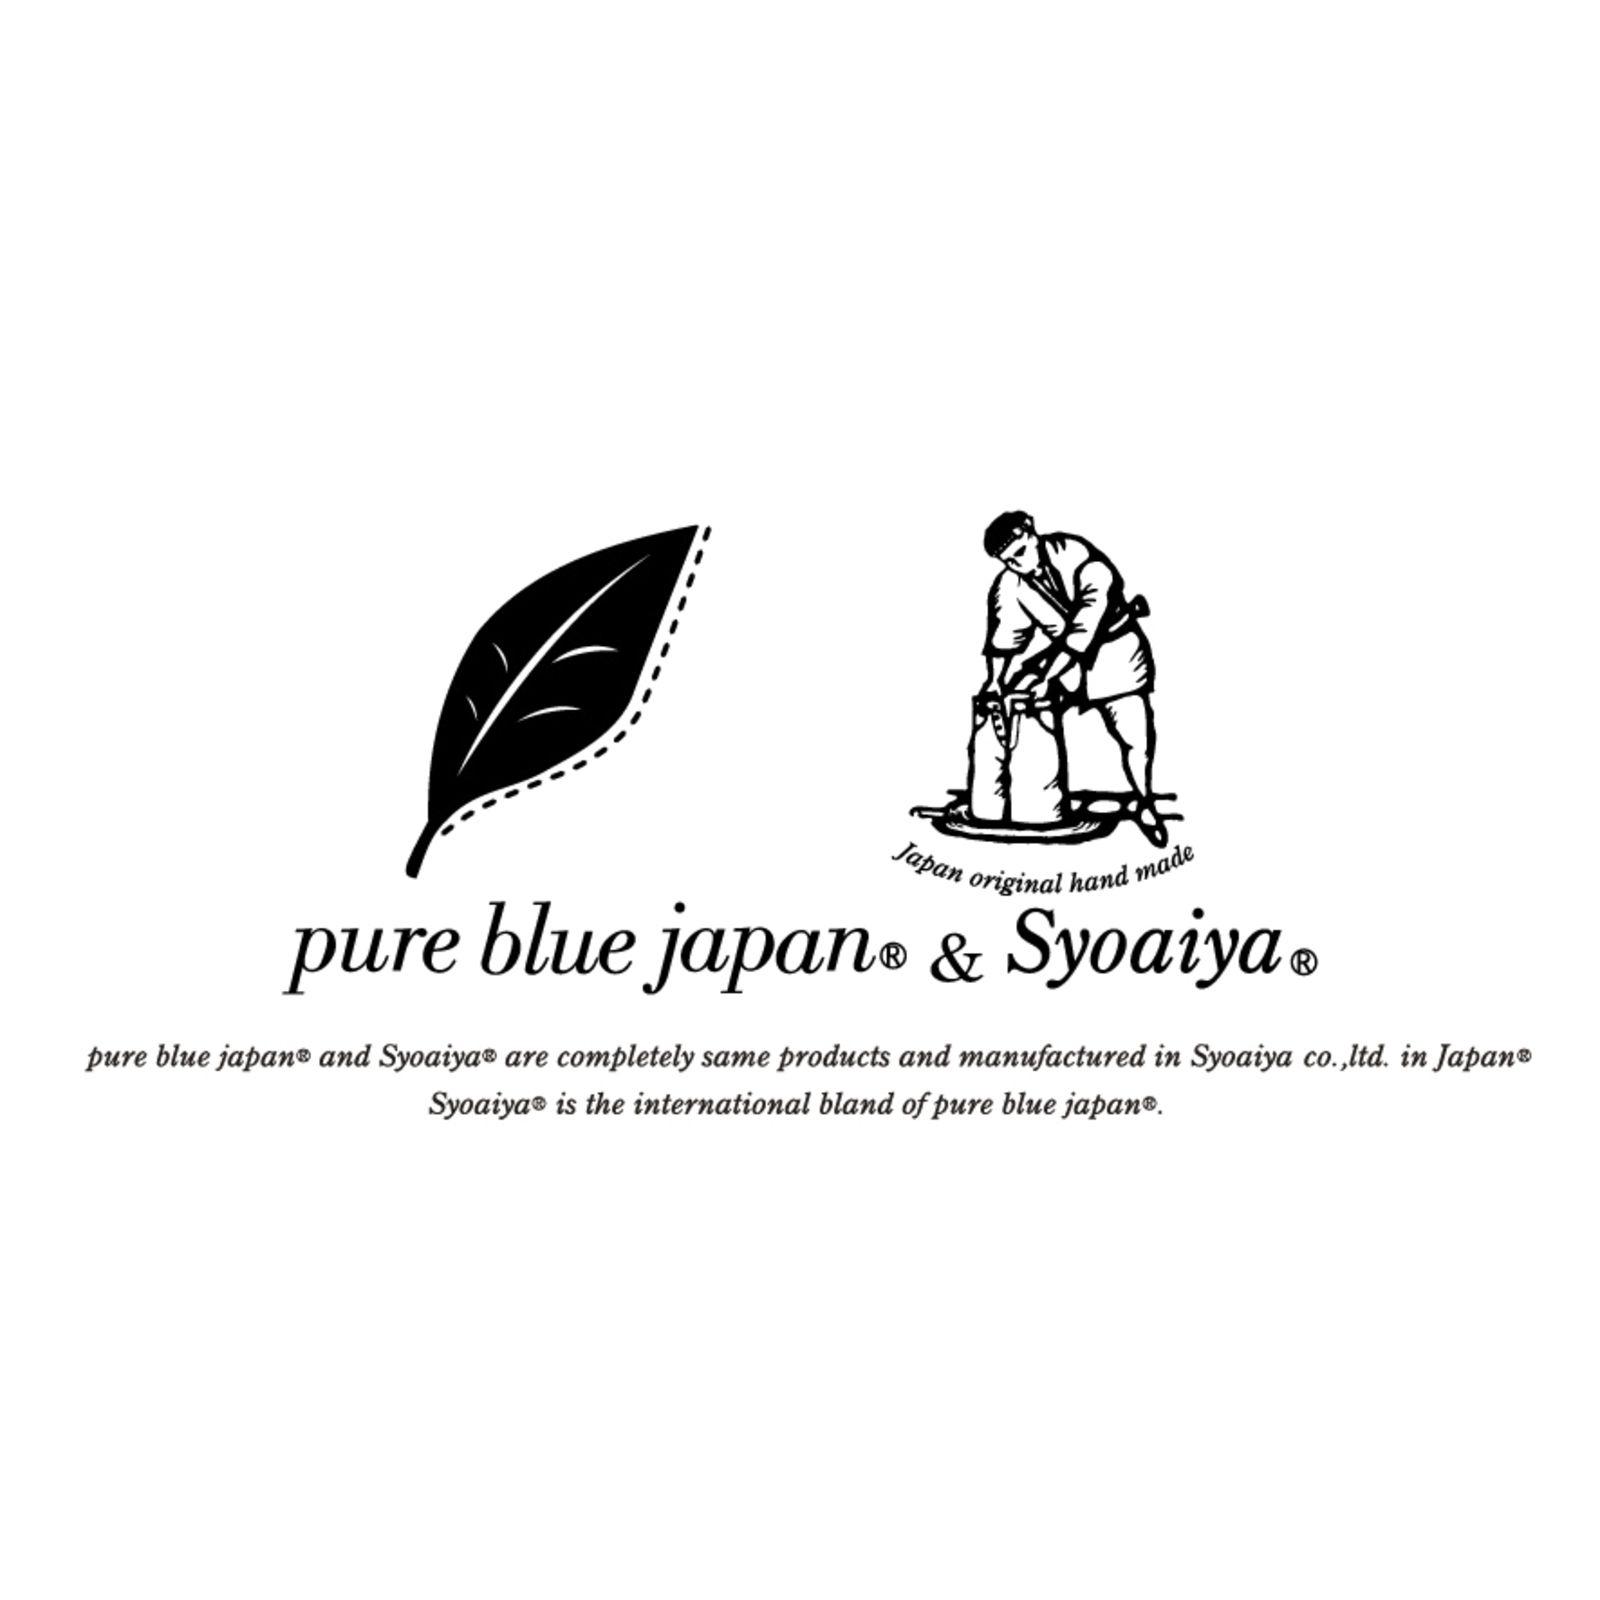 pure blue japan